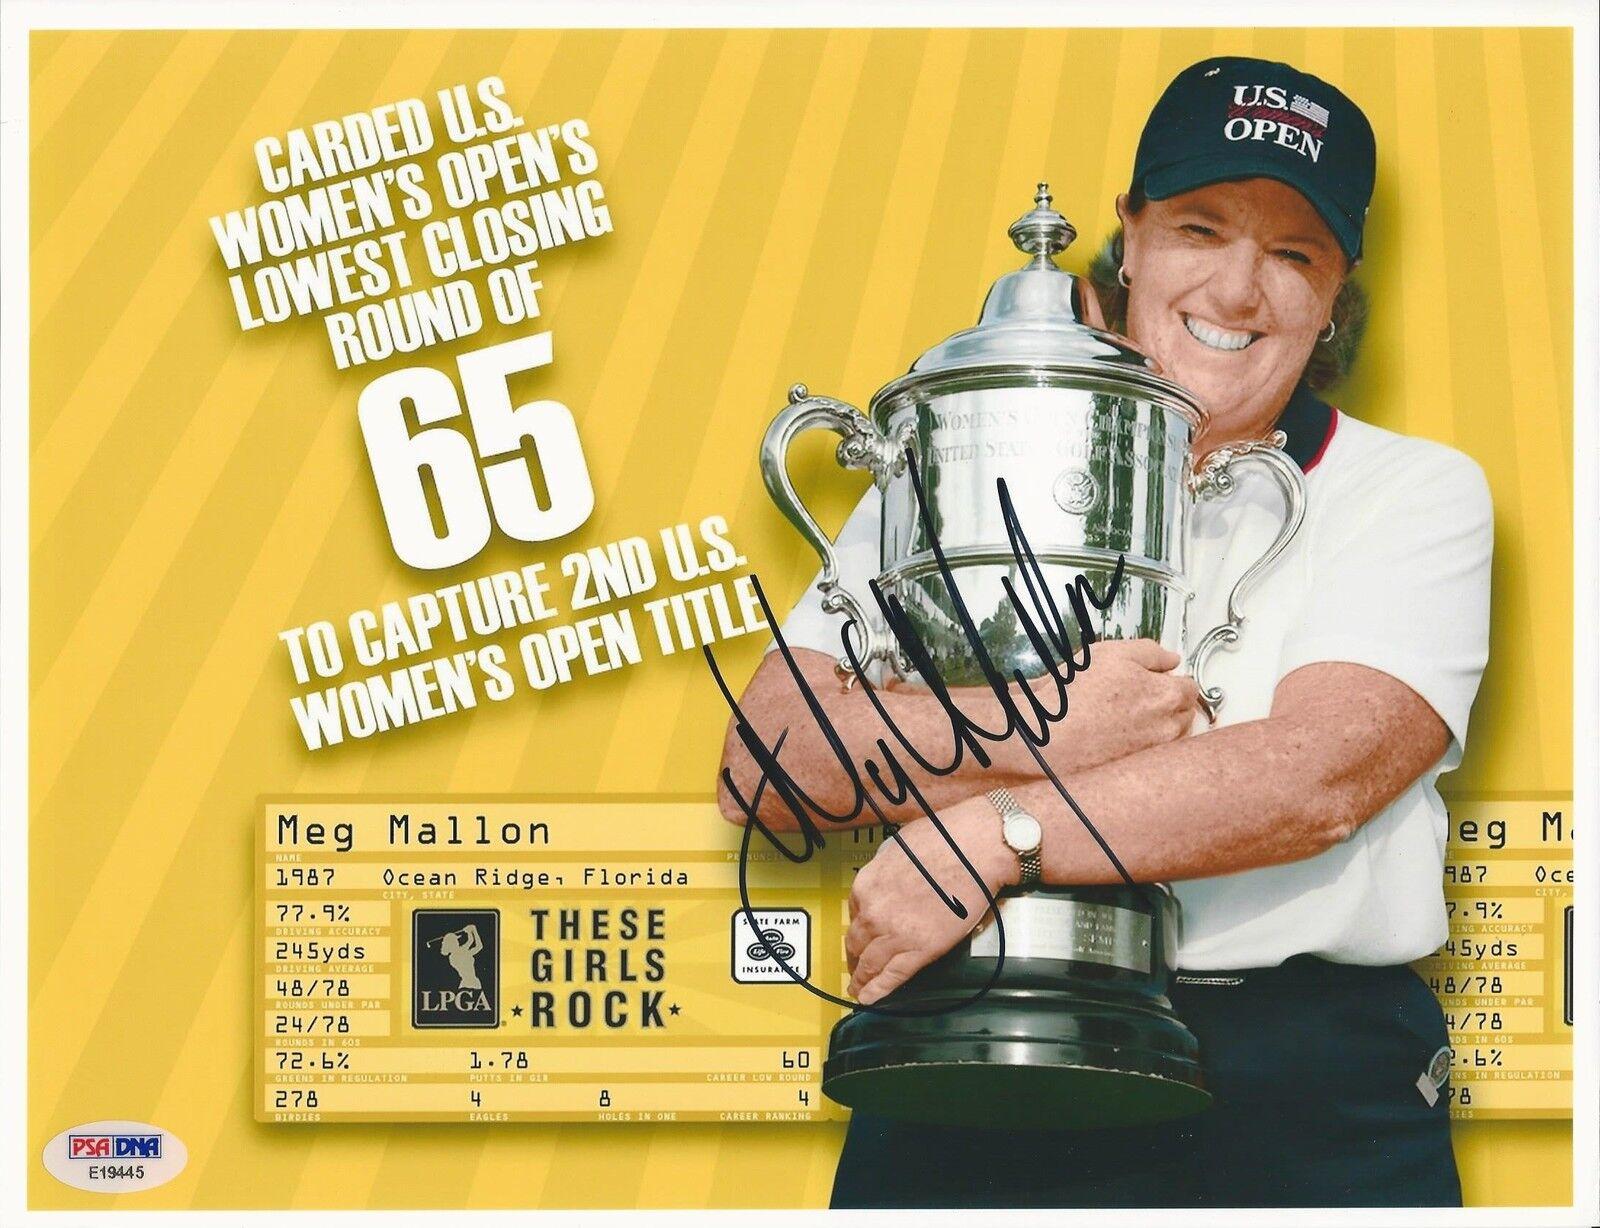 Meg Mallon LPGA Golf signed 8x10 photo PSA/DNA #E19445